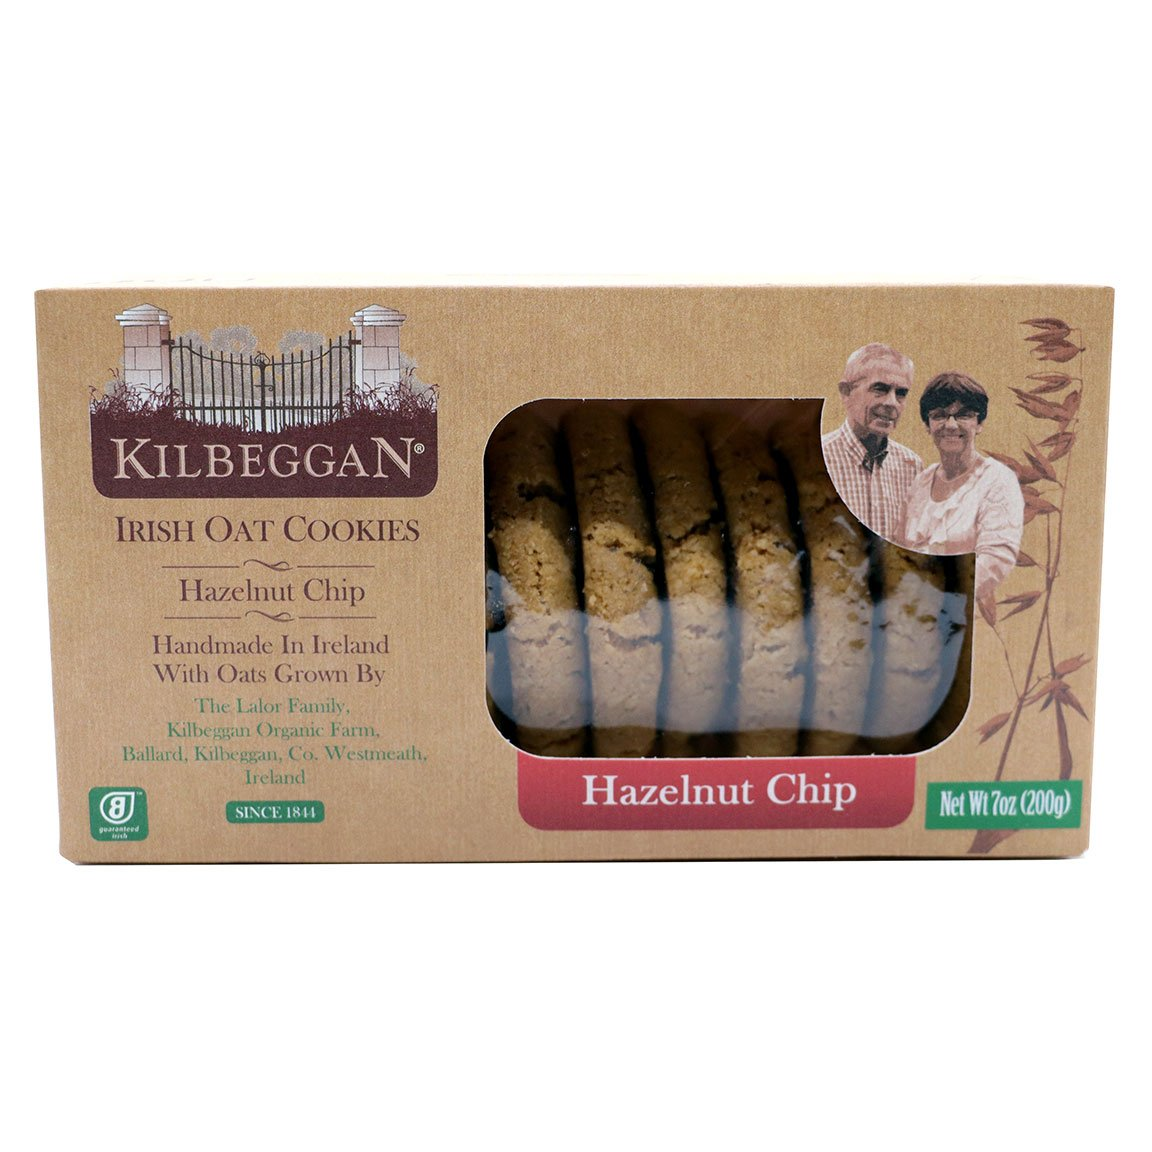 Kilbeggan Hazelnut Chip Irish Oat Cookies